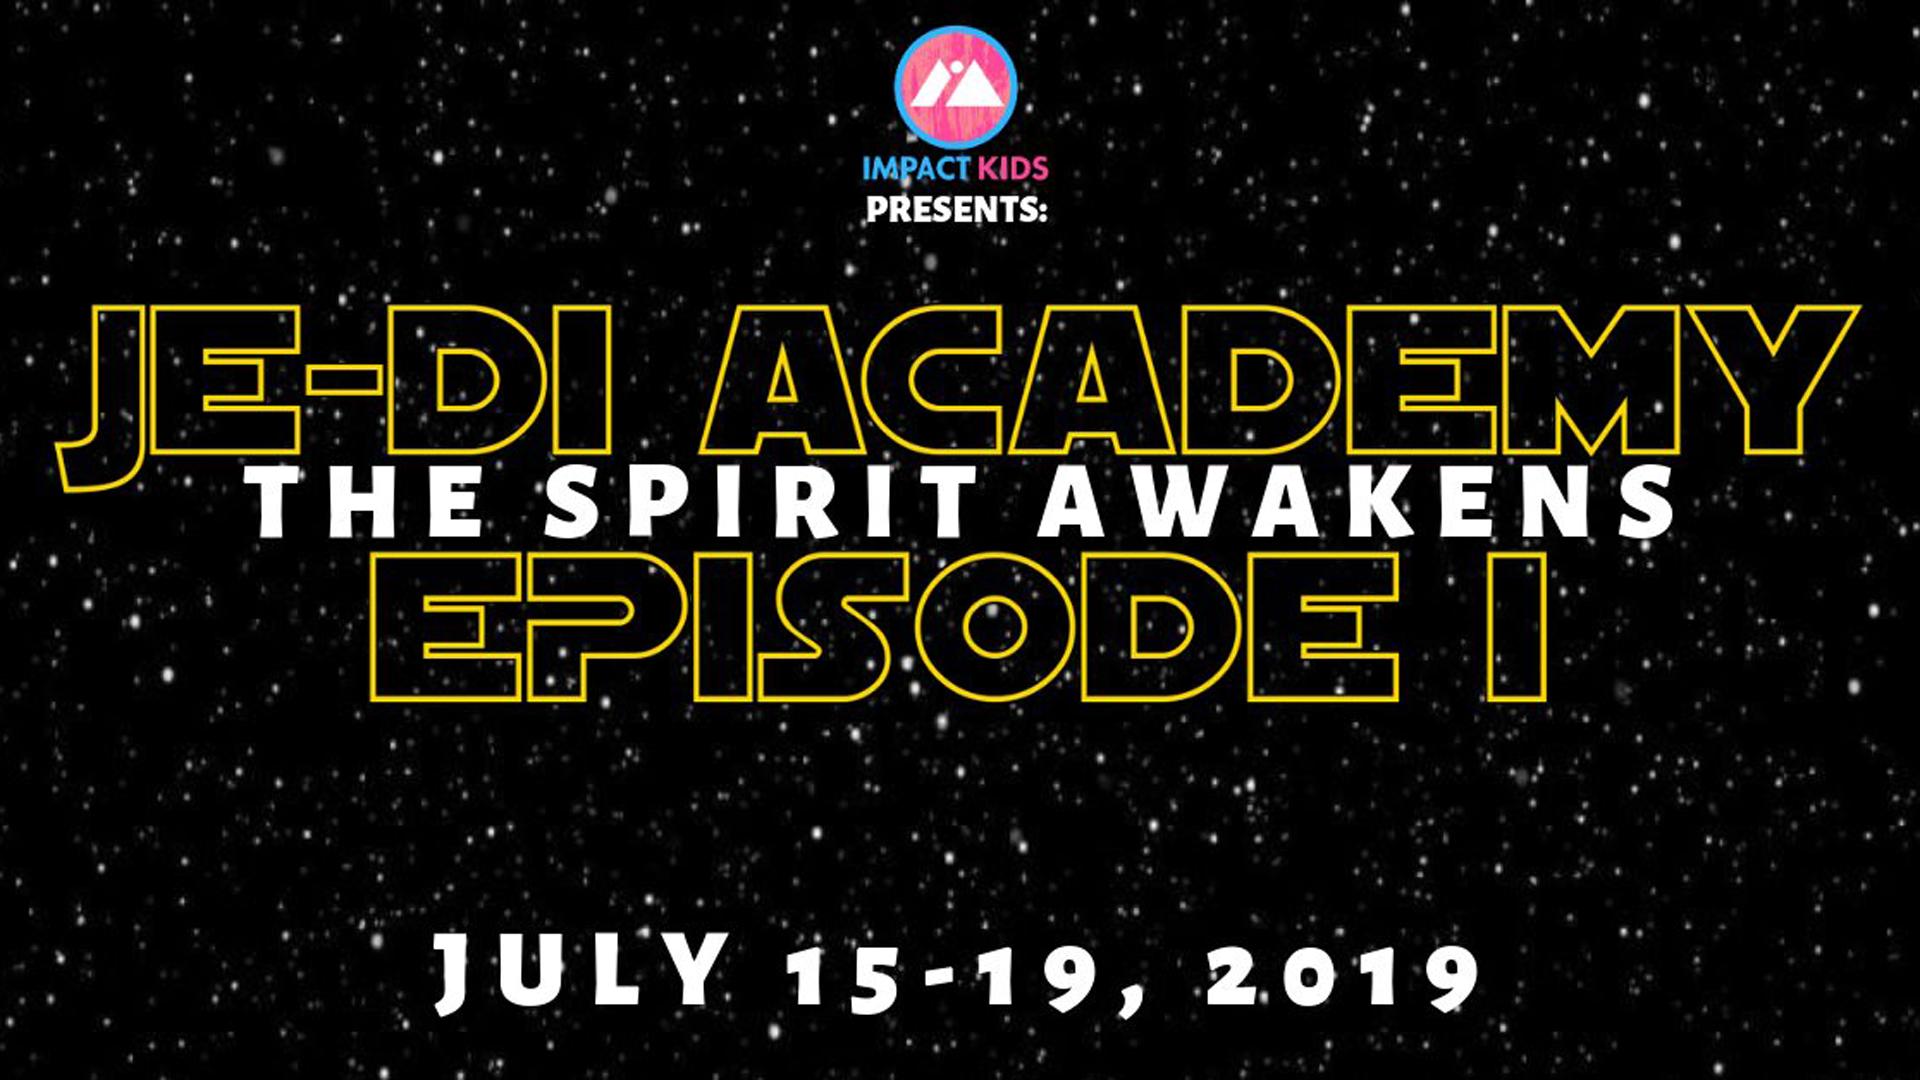 Je-Di Academy - The Spirit Awakens - VBS.jpg